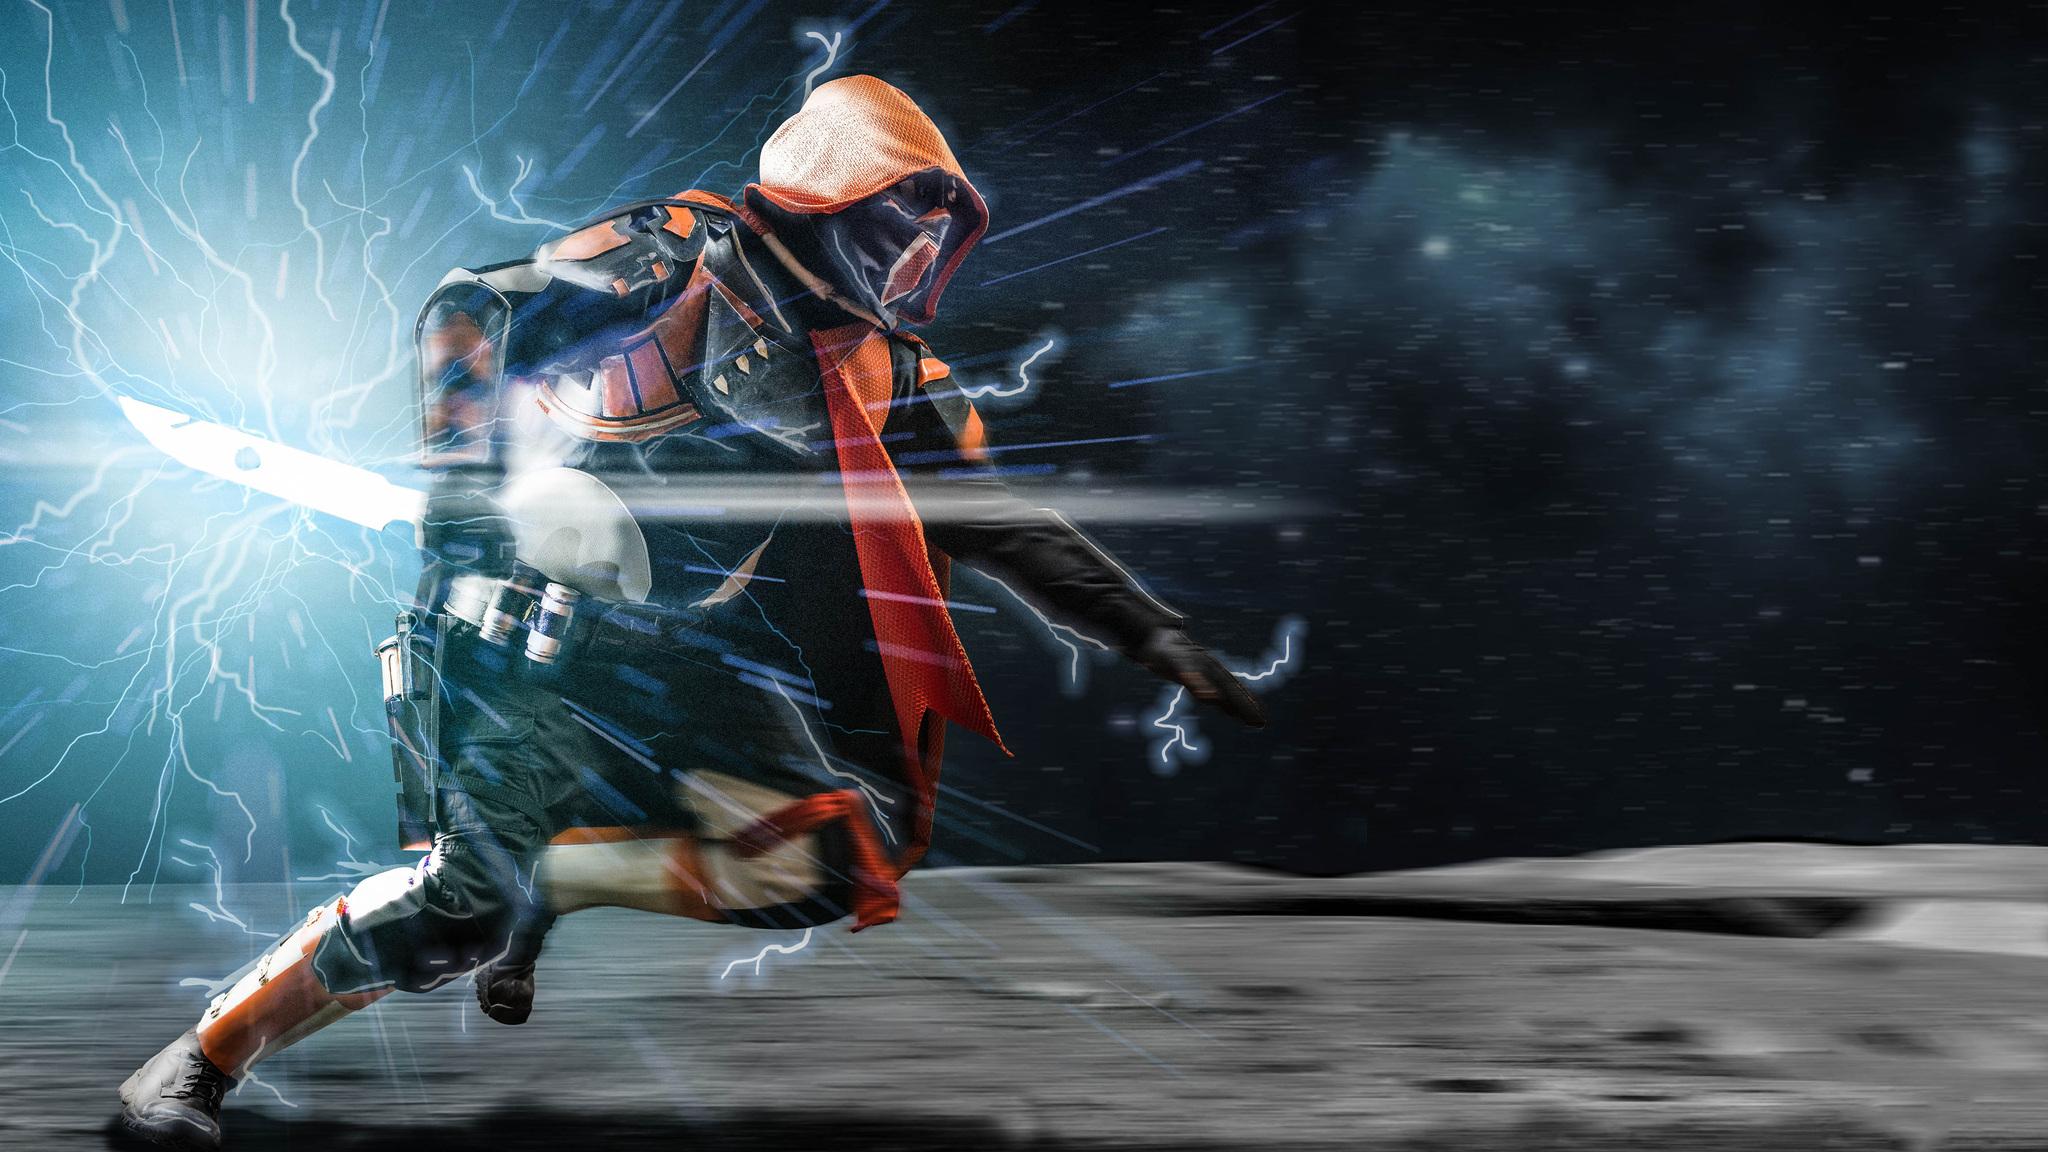 2048x1152 hunter destiny 2 cosplay 2048x1152 resolution hd - 4k destiny 2 wallpaper ...